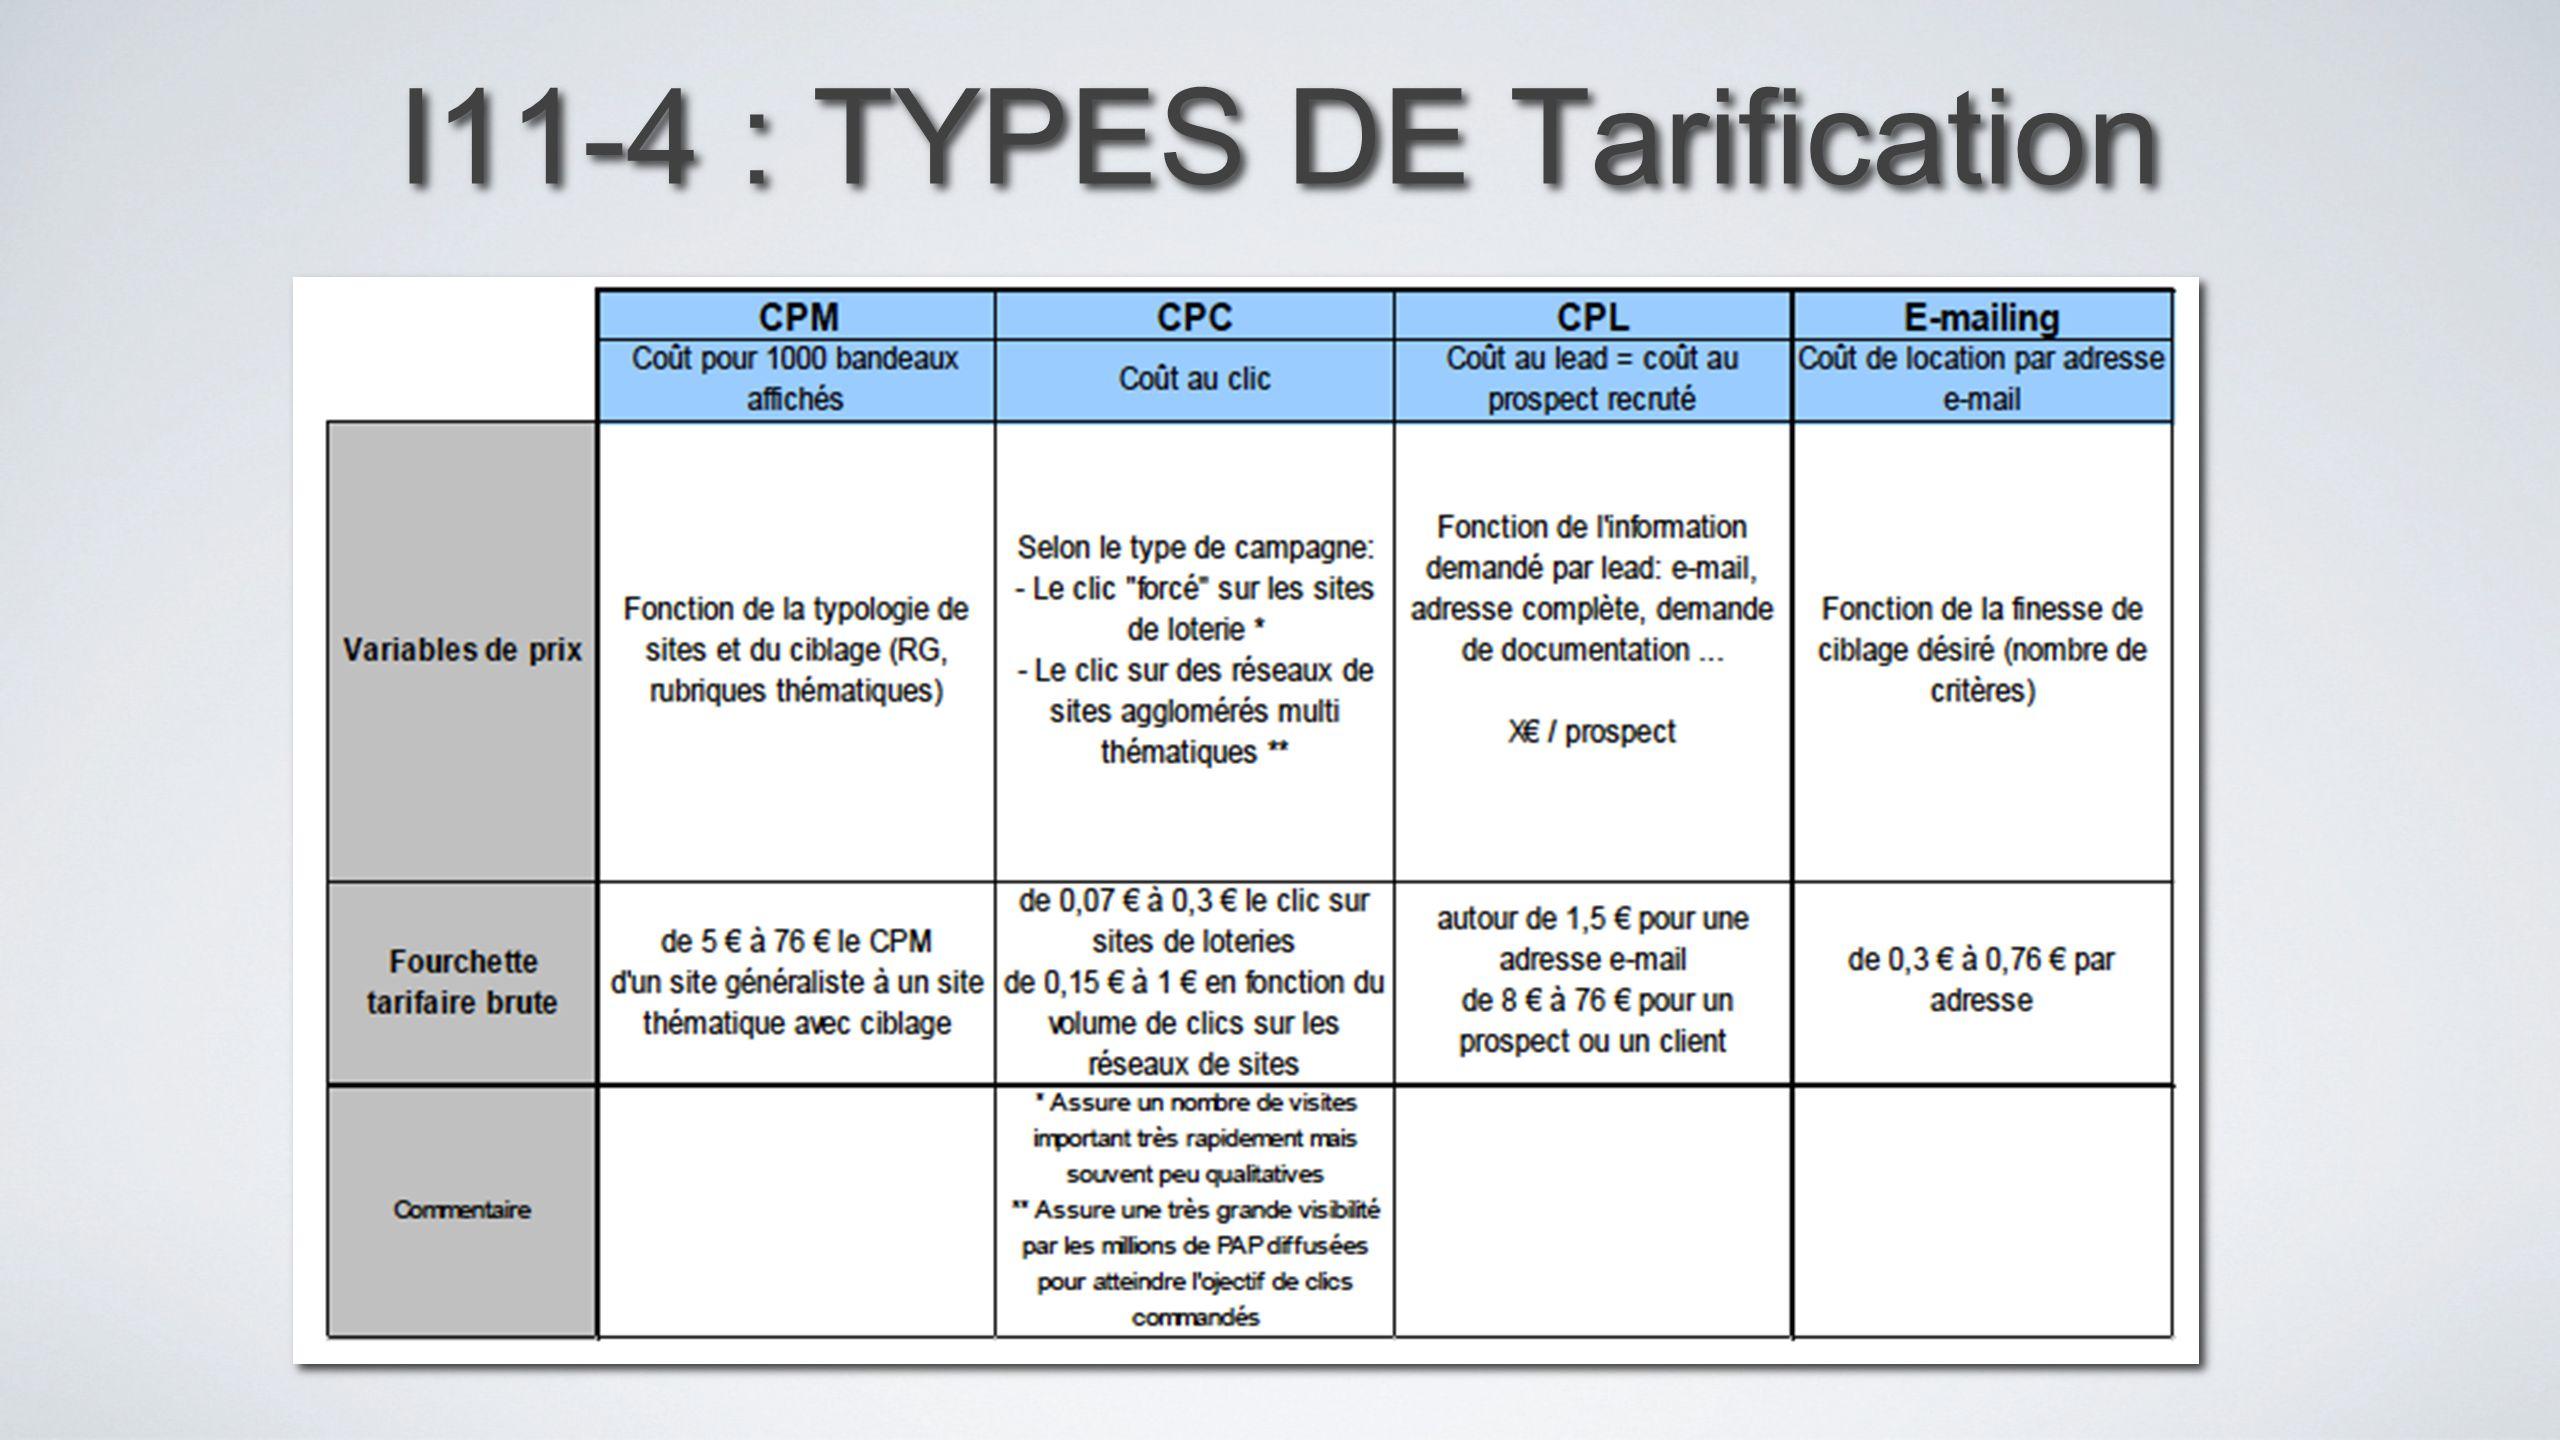 I11-4 : TYPES DE Tarification